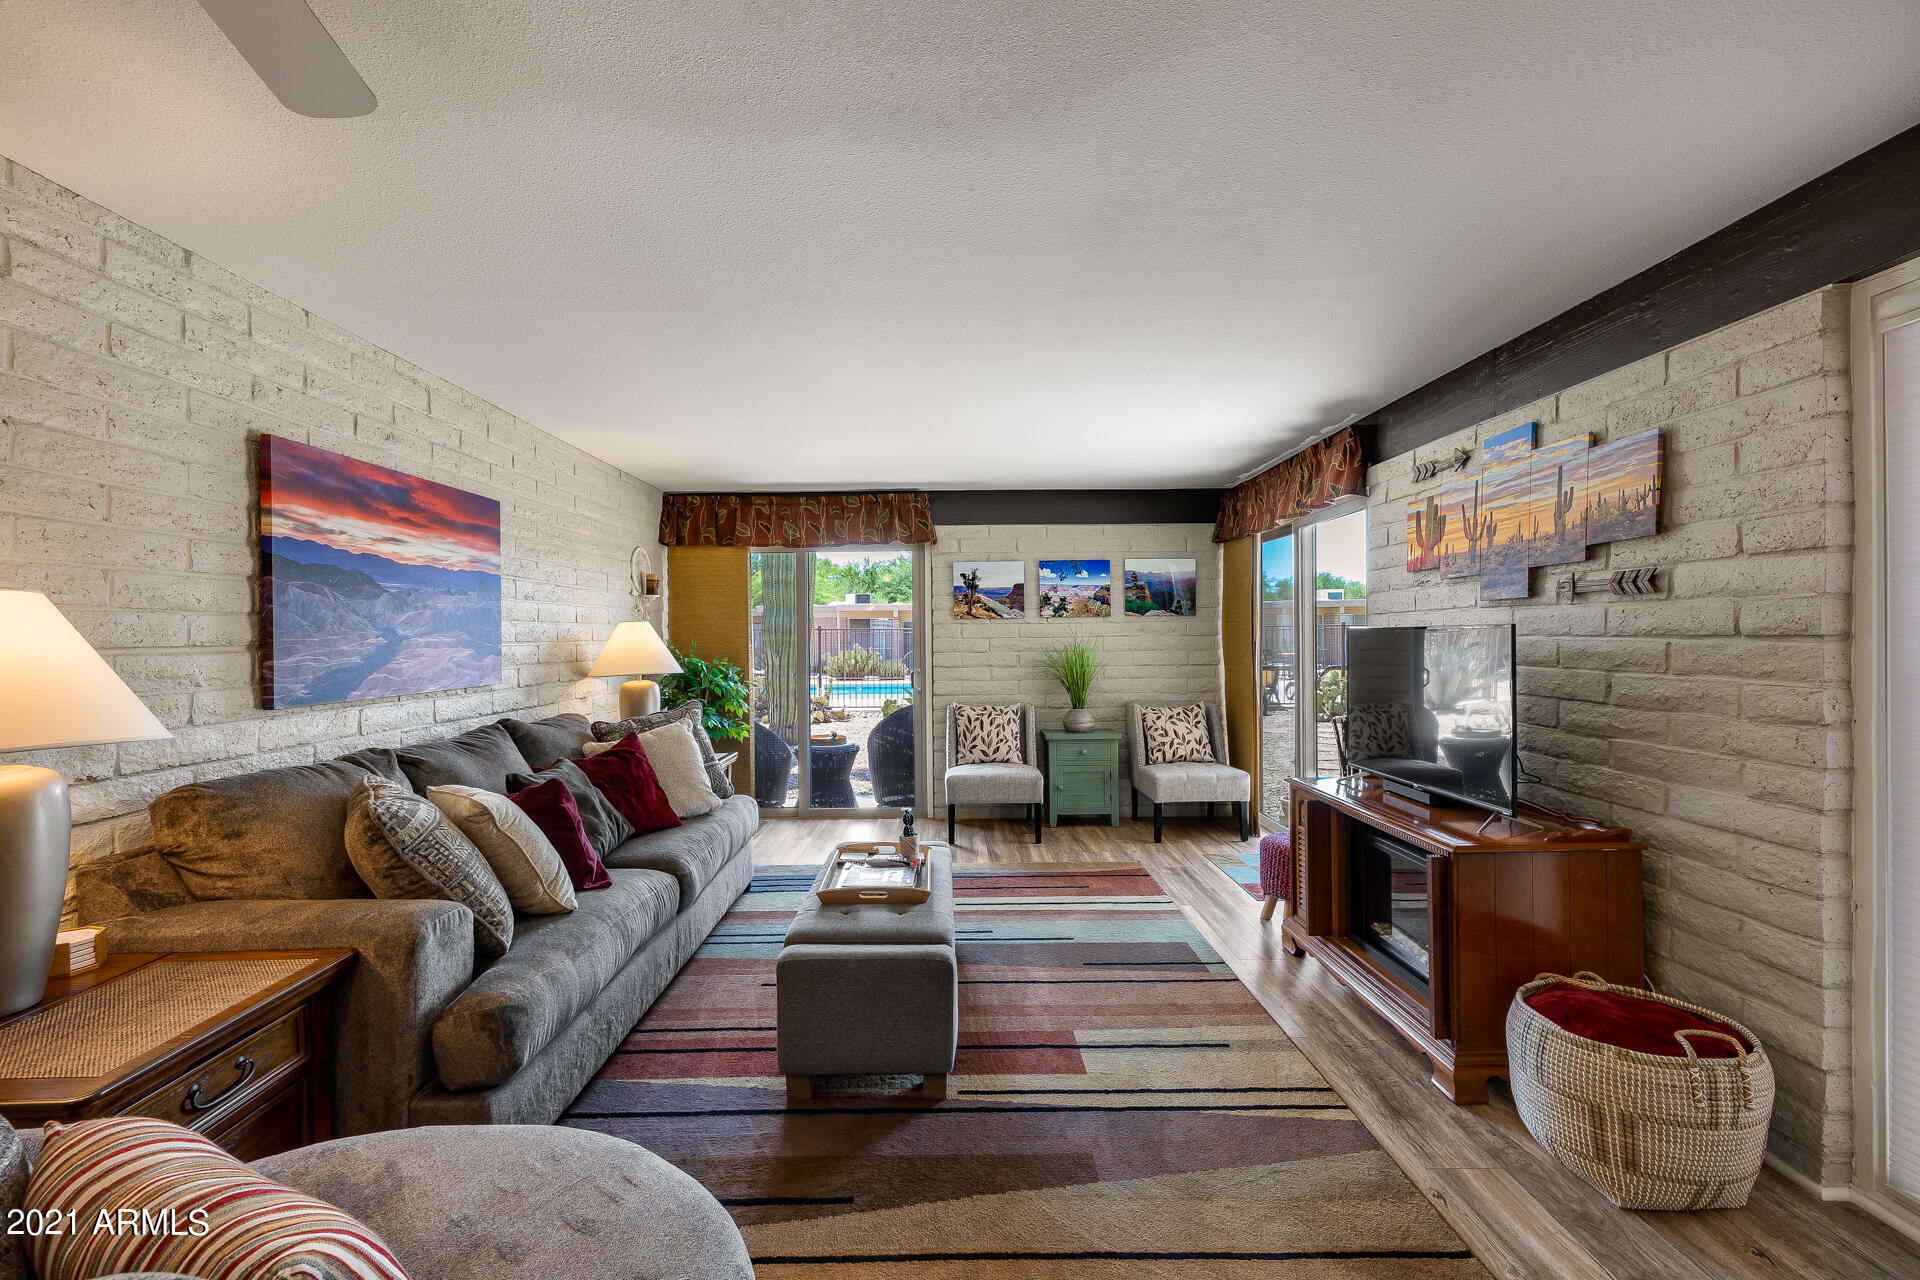 Photo #3: Living Area